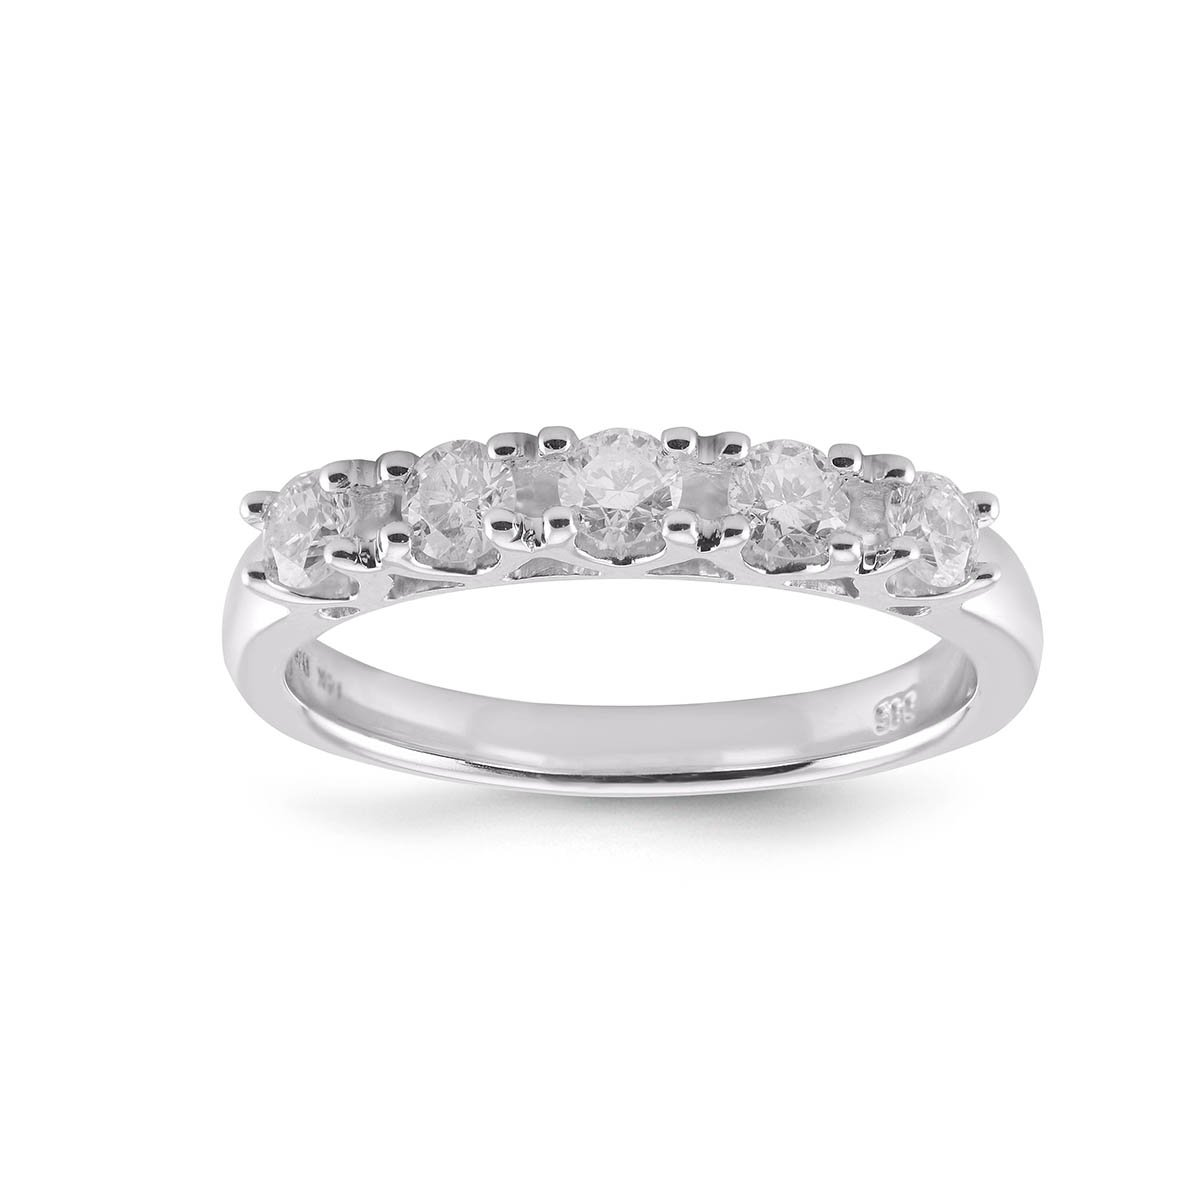 Diamond2Deal 5 Stone Diamond Wedding Ring in 14K White Gold 0.25ct Size 6 by Diamond2Deal